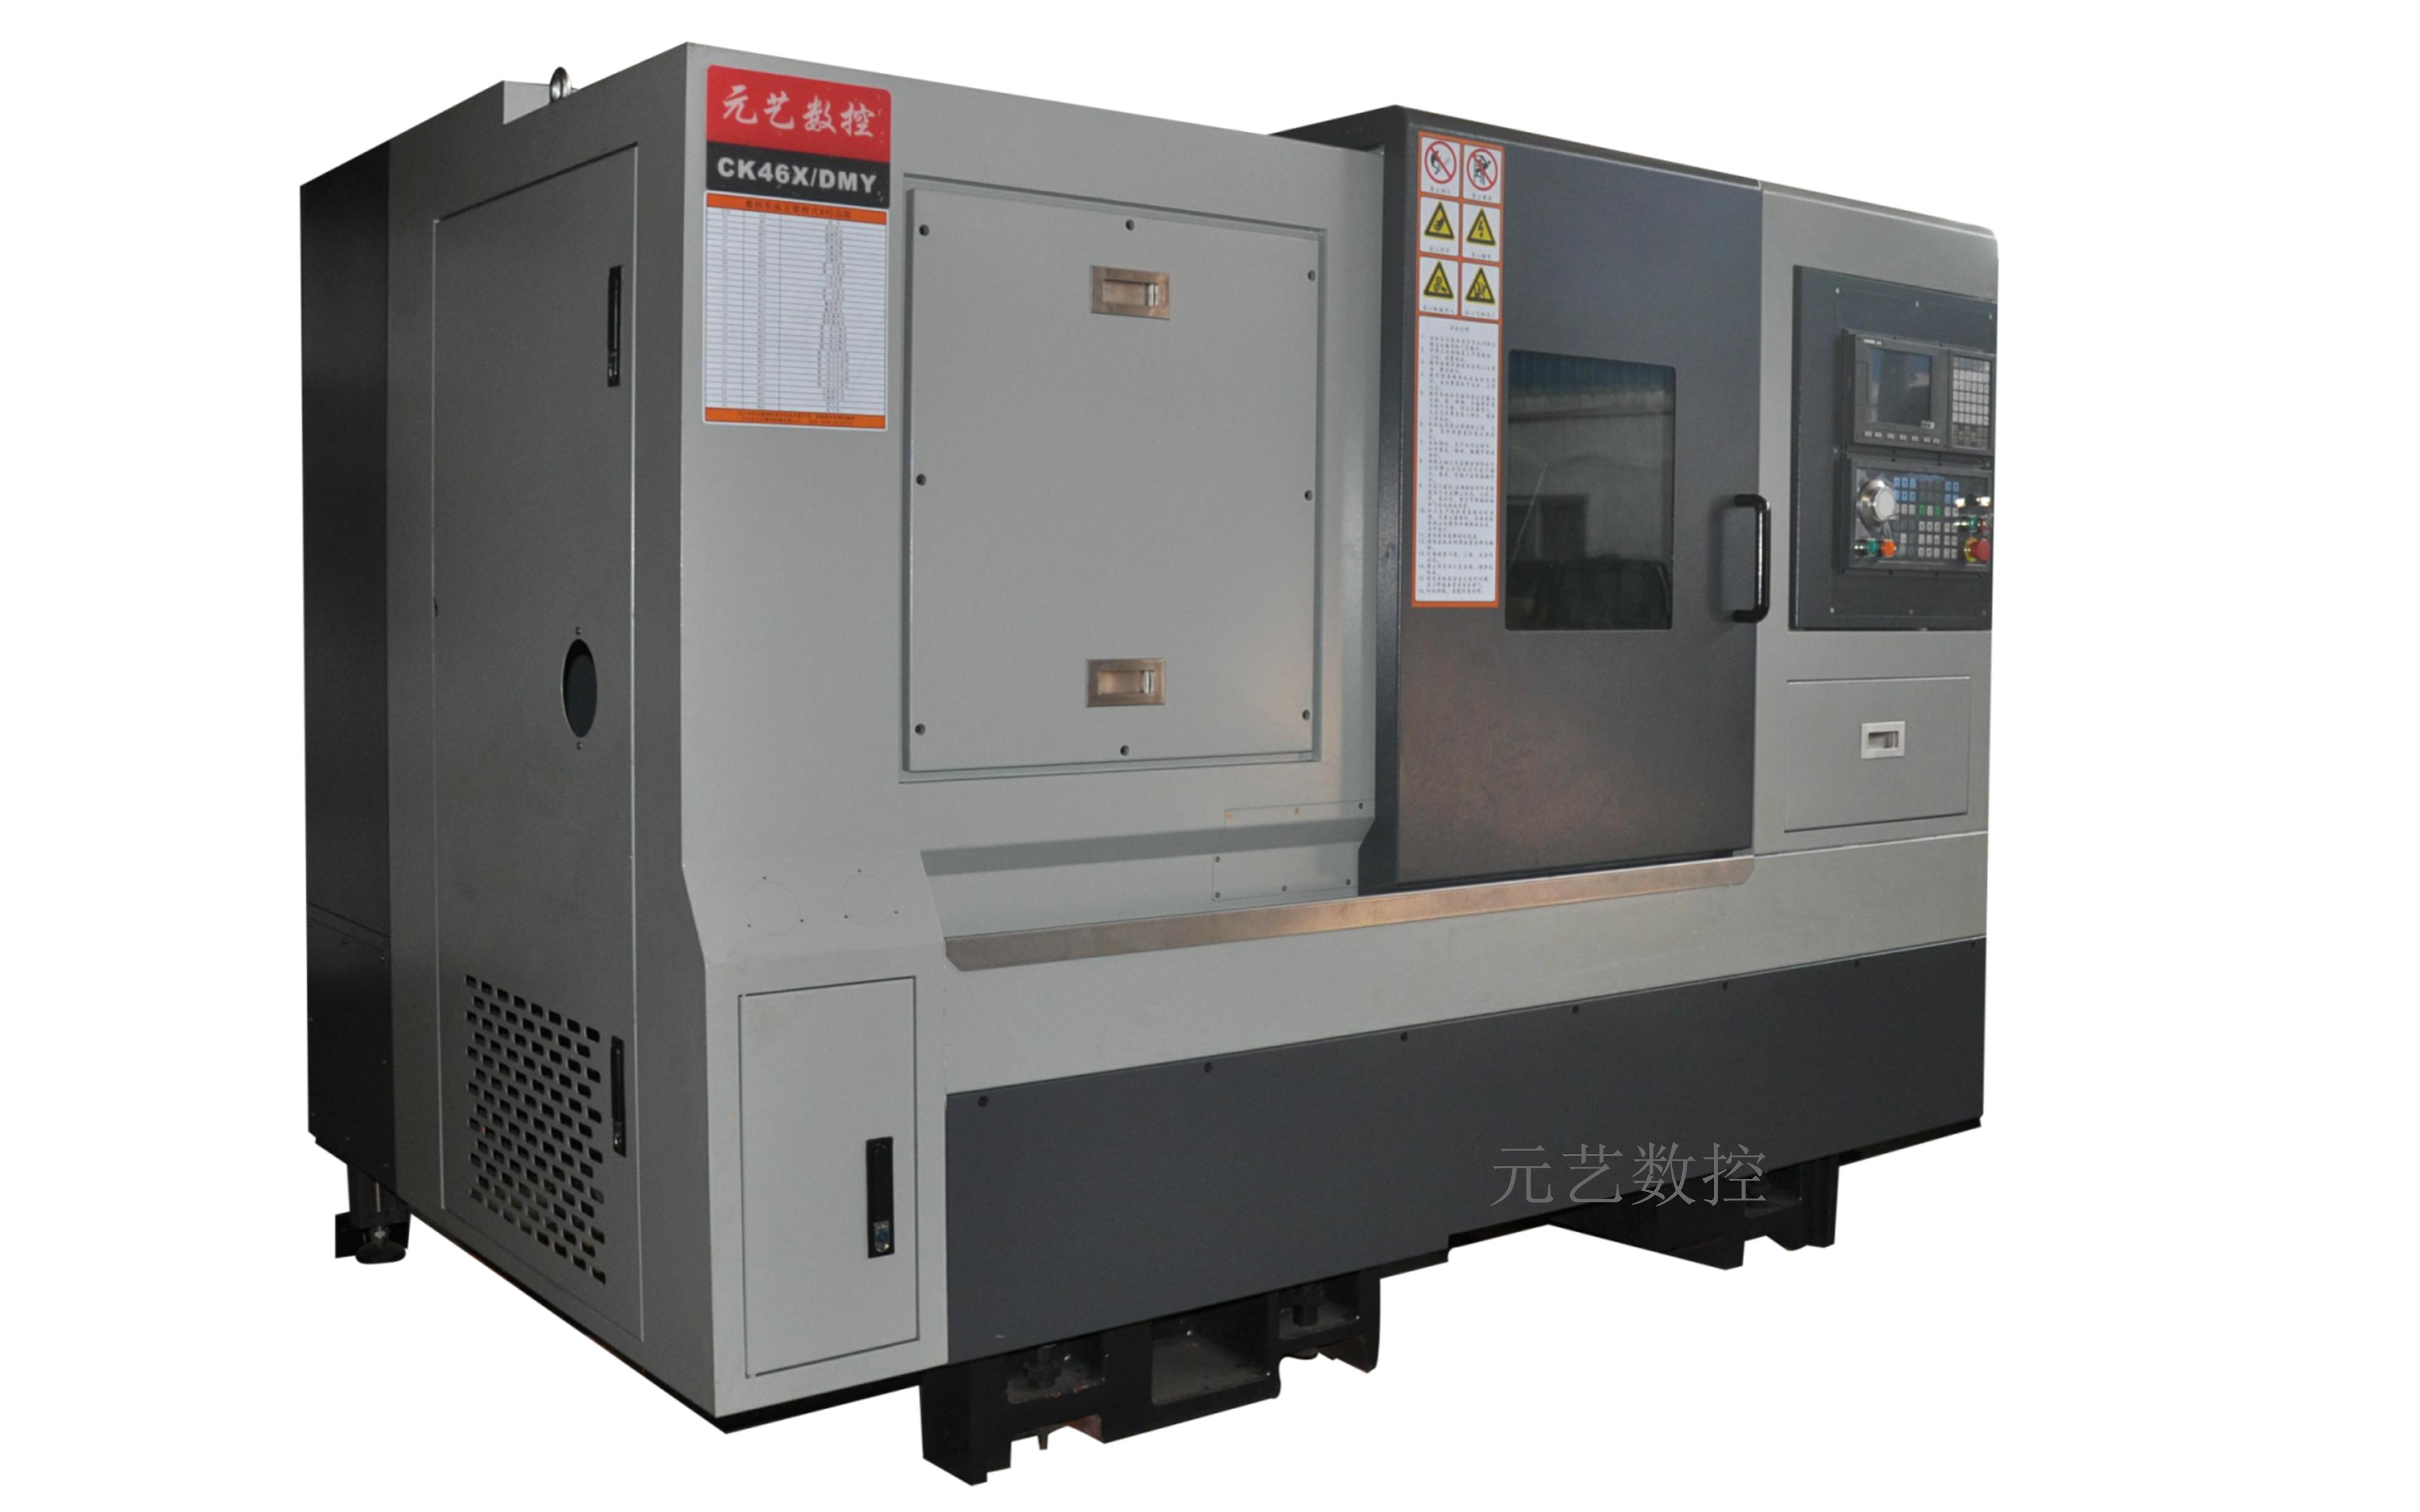 CK46X/DMY 动力刀塔Y轴车铣复合数控车床